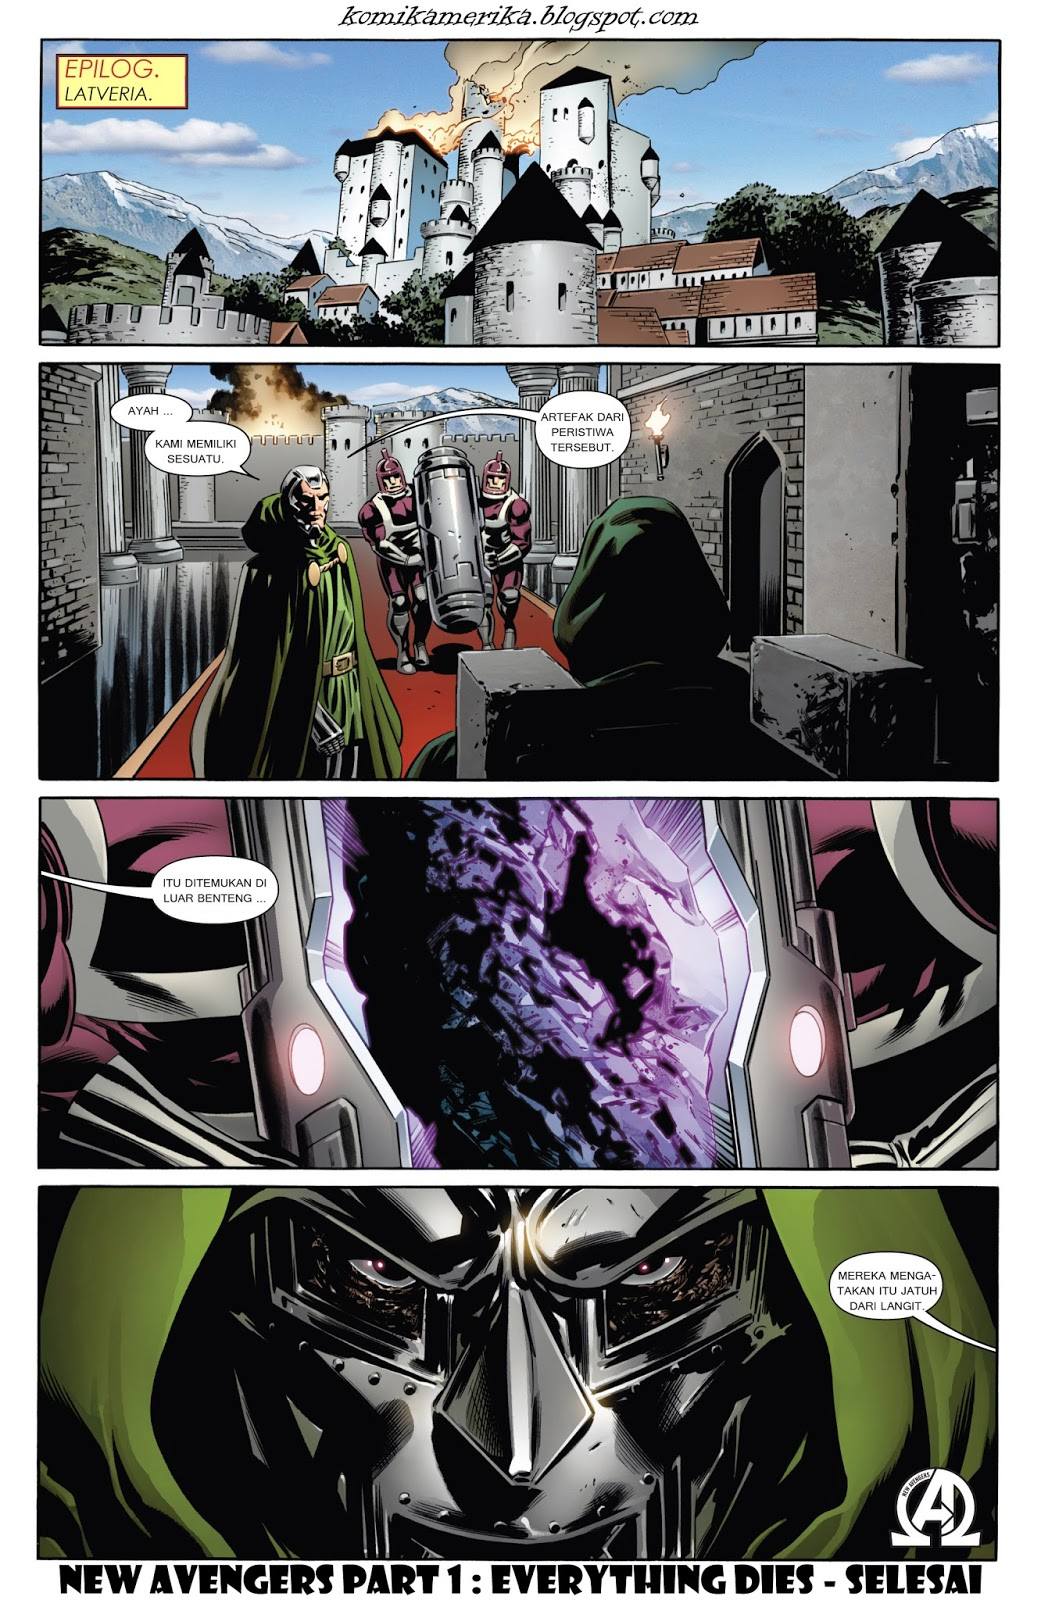 komik amerika bahasa indonesia new avengers 6